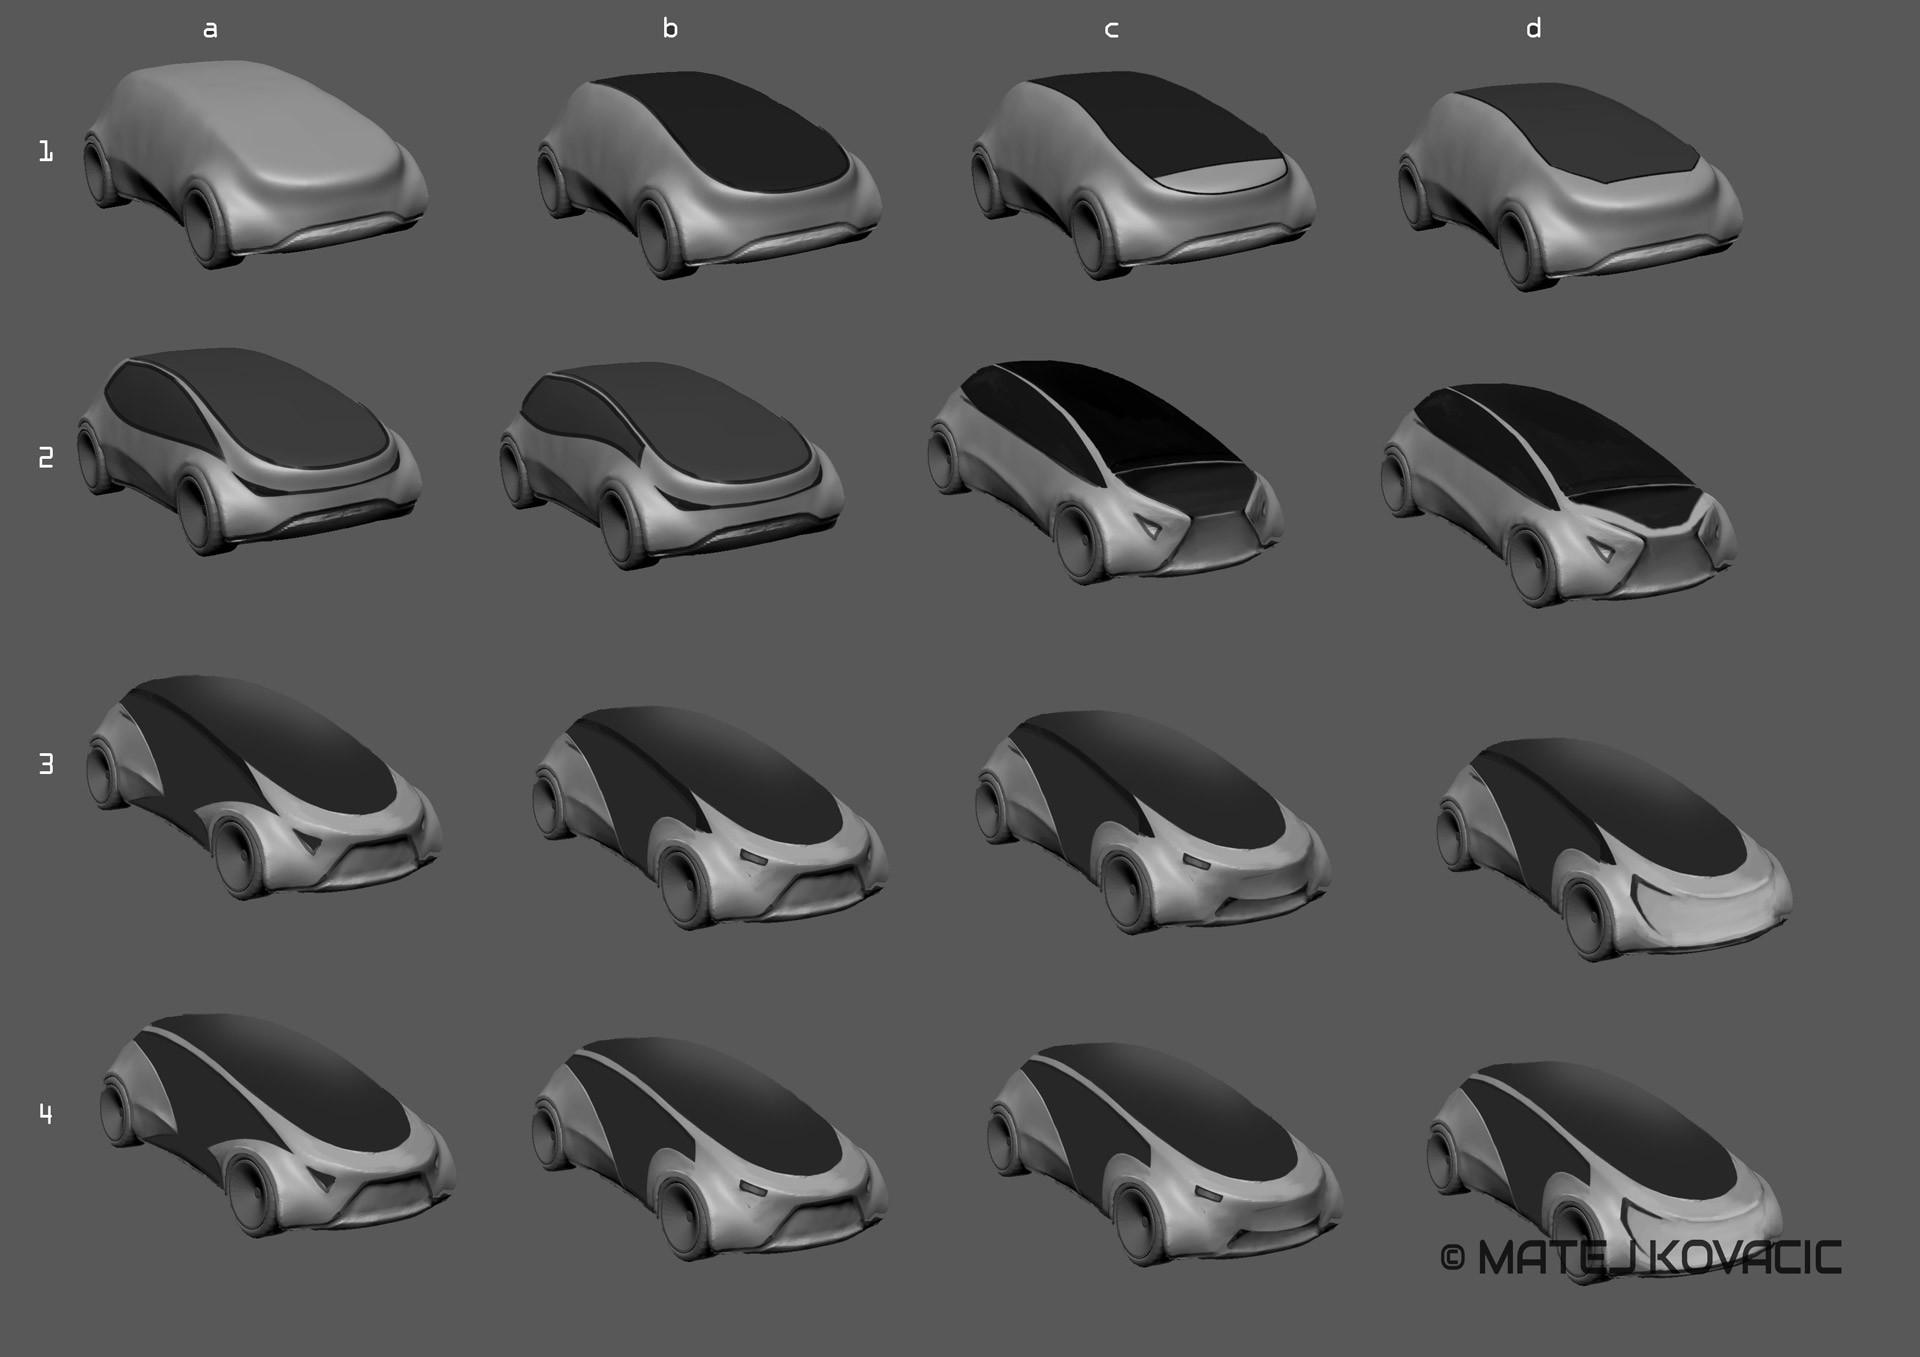 Matej kovacic hologram car concept by matej kovacic